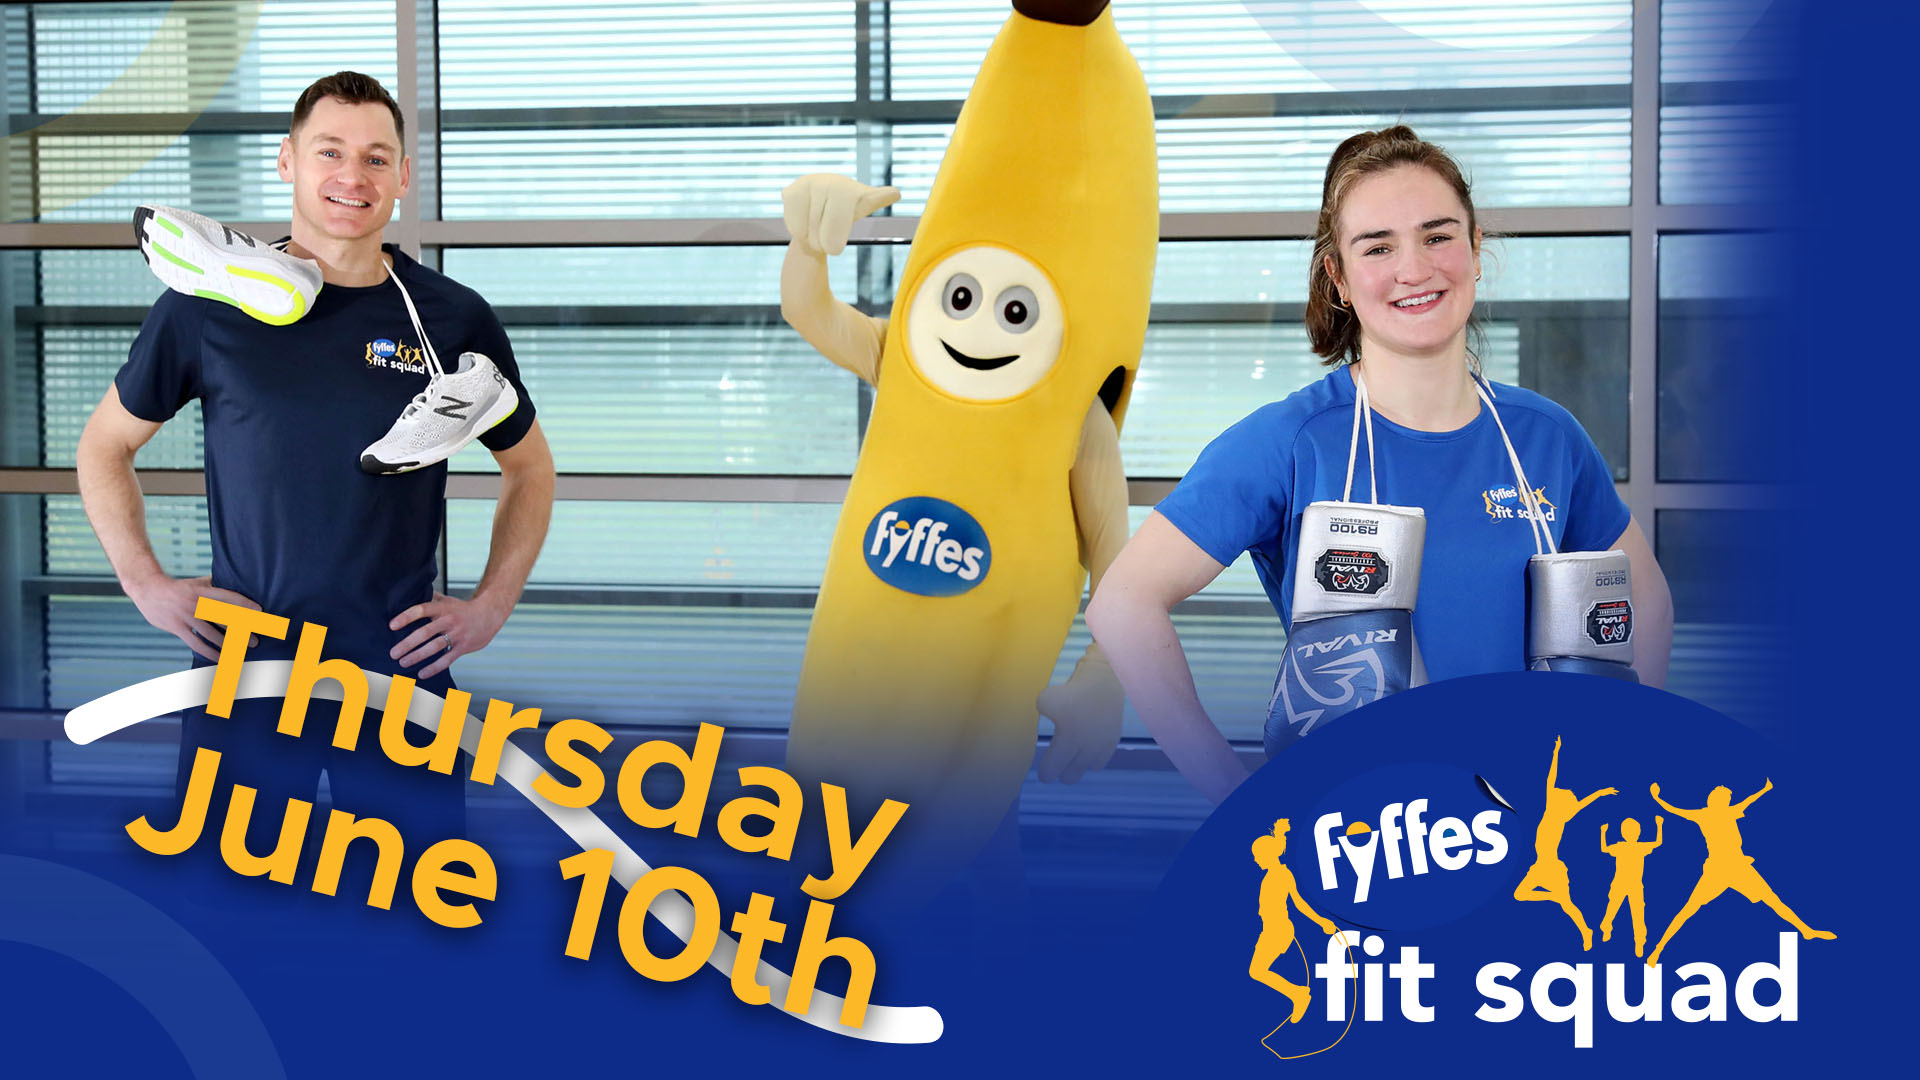 Fyffes Fit Squad Week 12 | Thursday, June 10th 2021